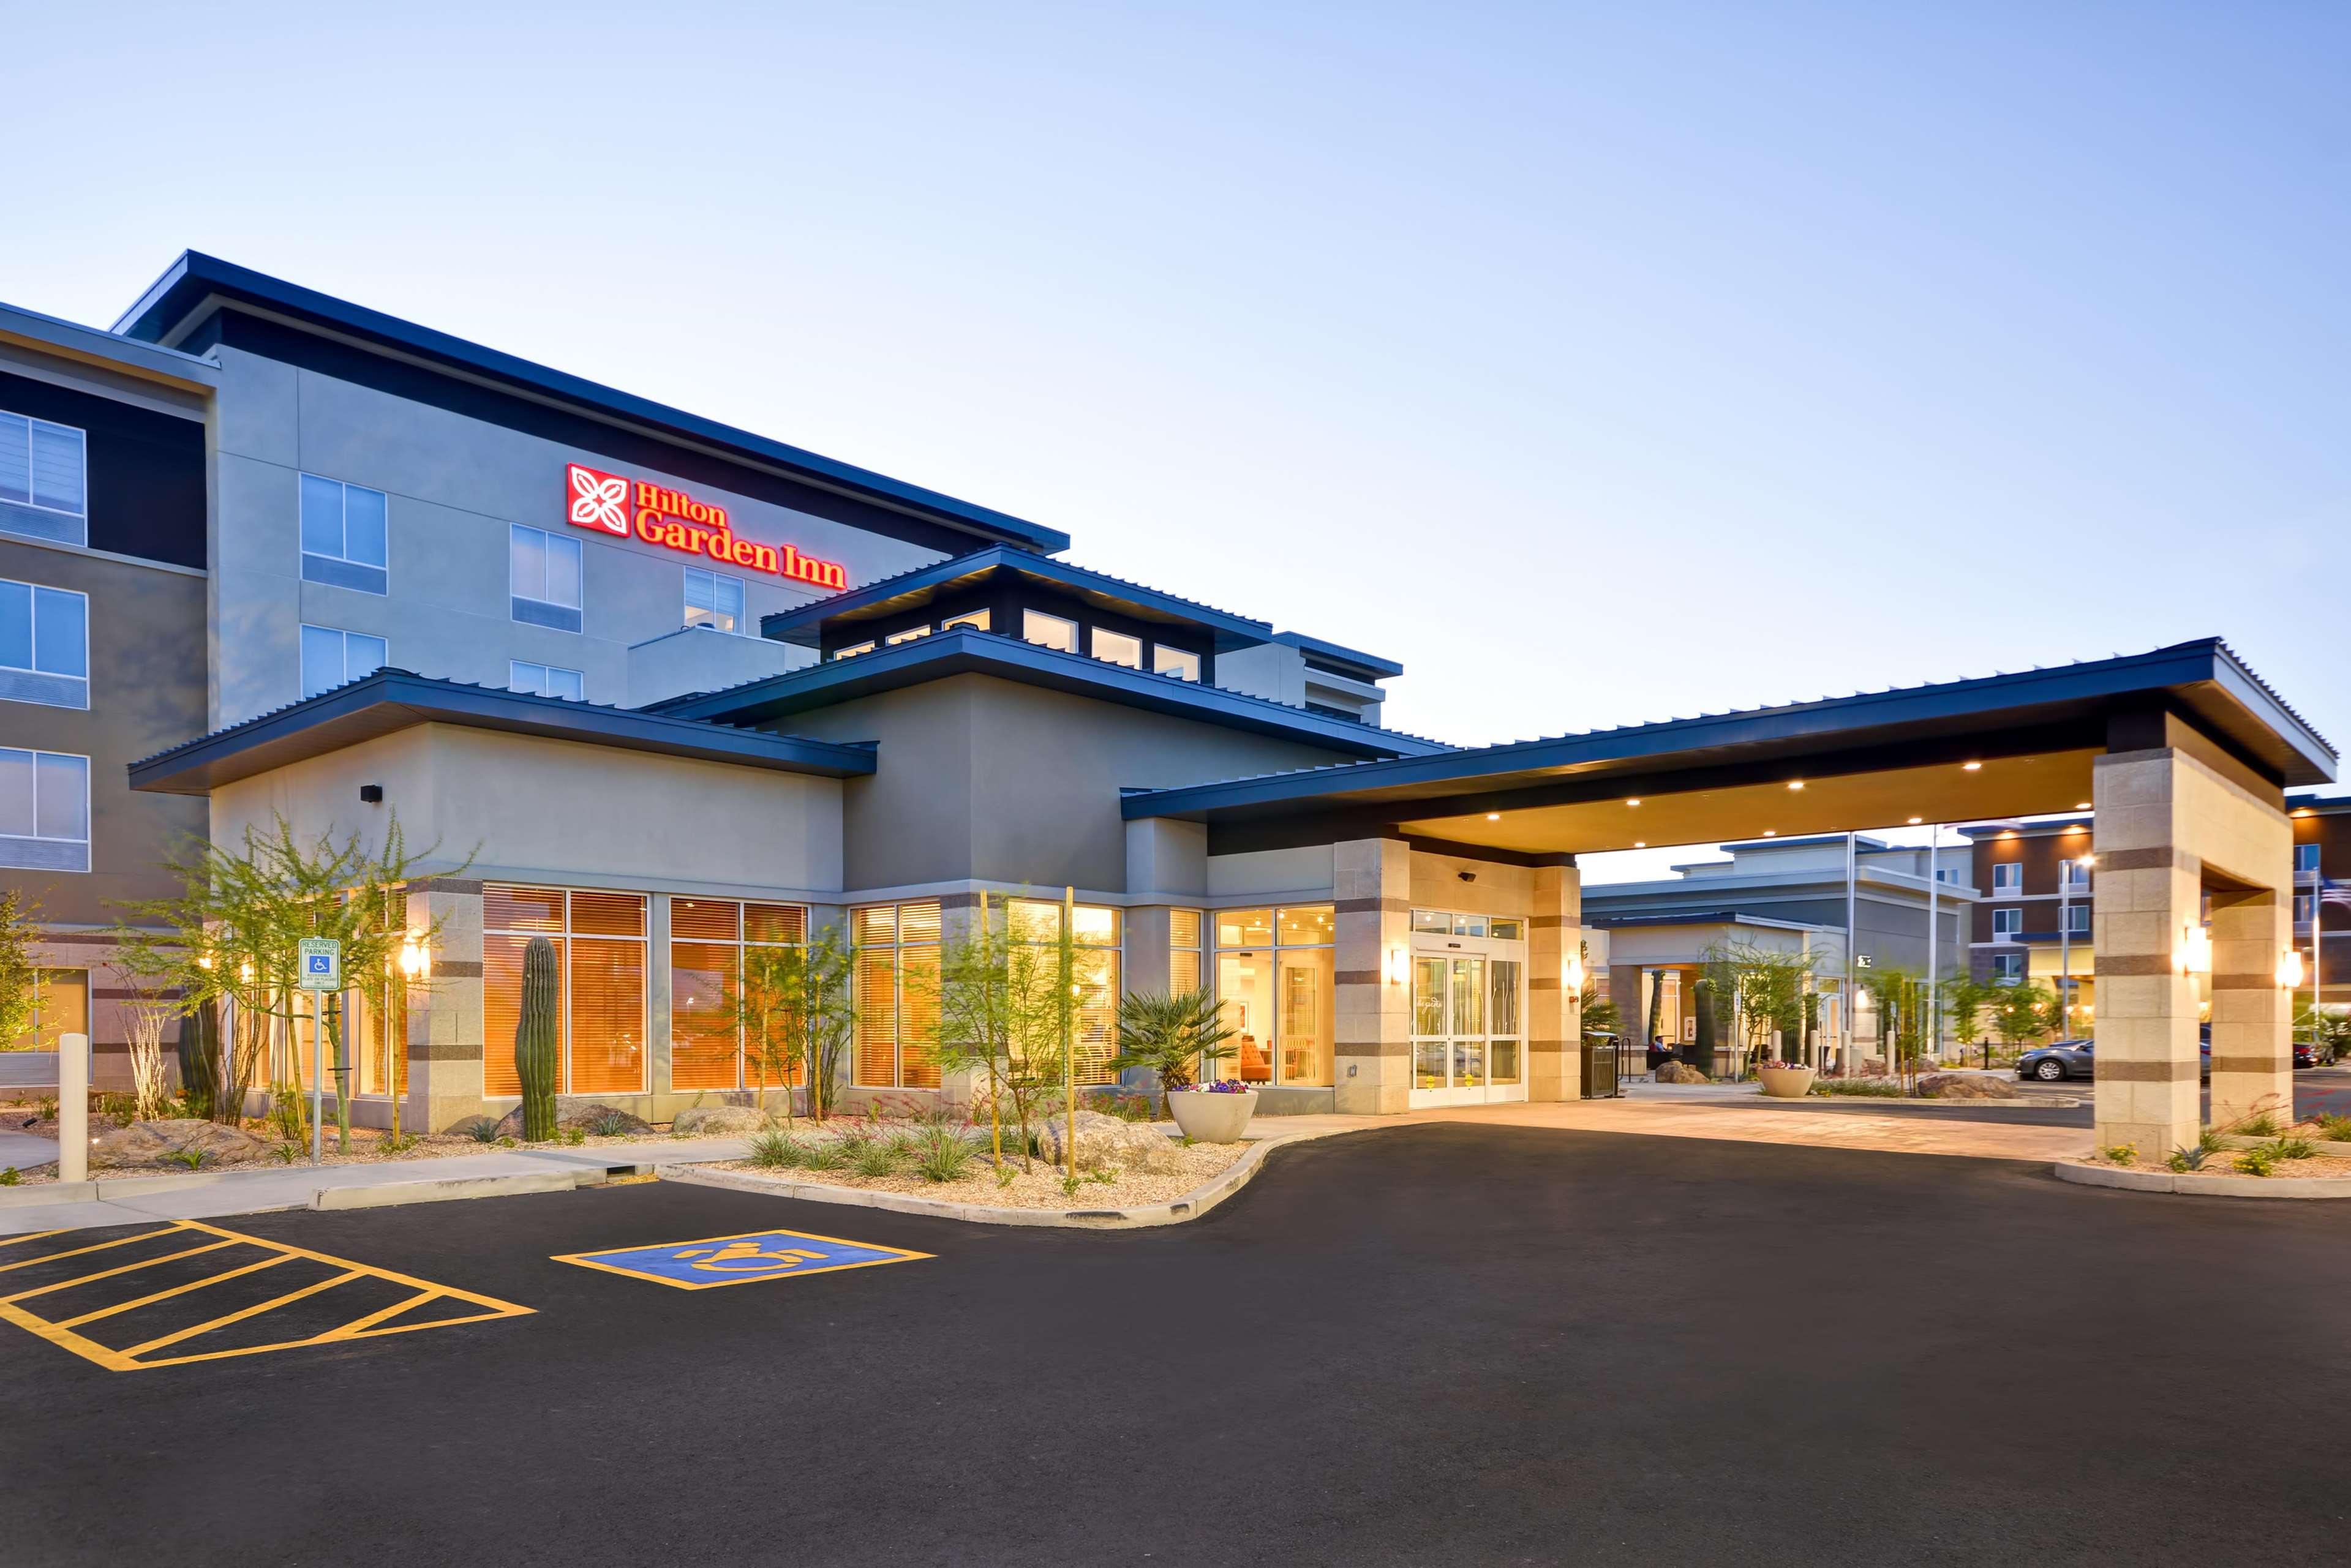 Hilton Garden Inn Phoenix/Tempe ASU Area image 2